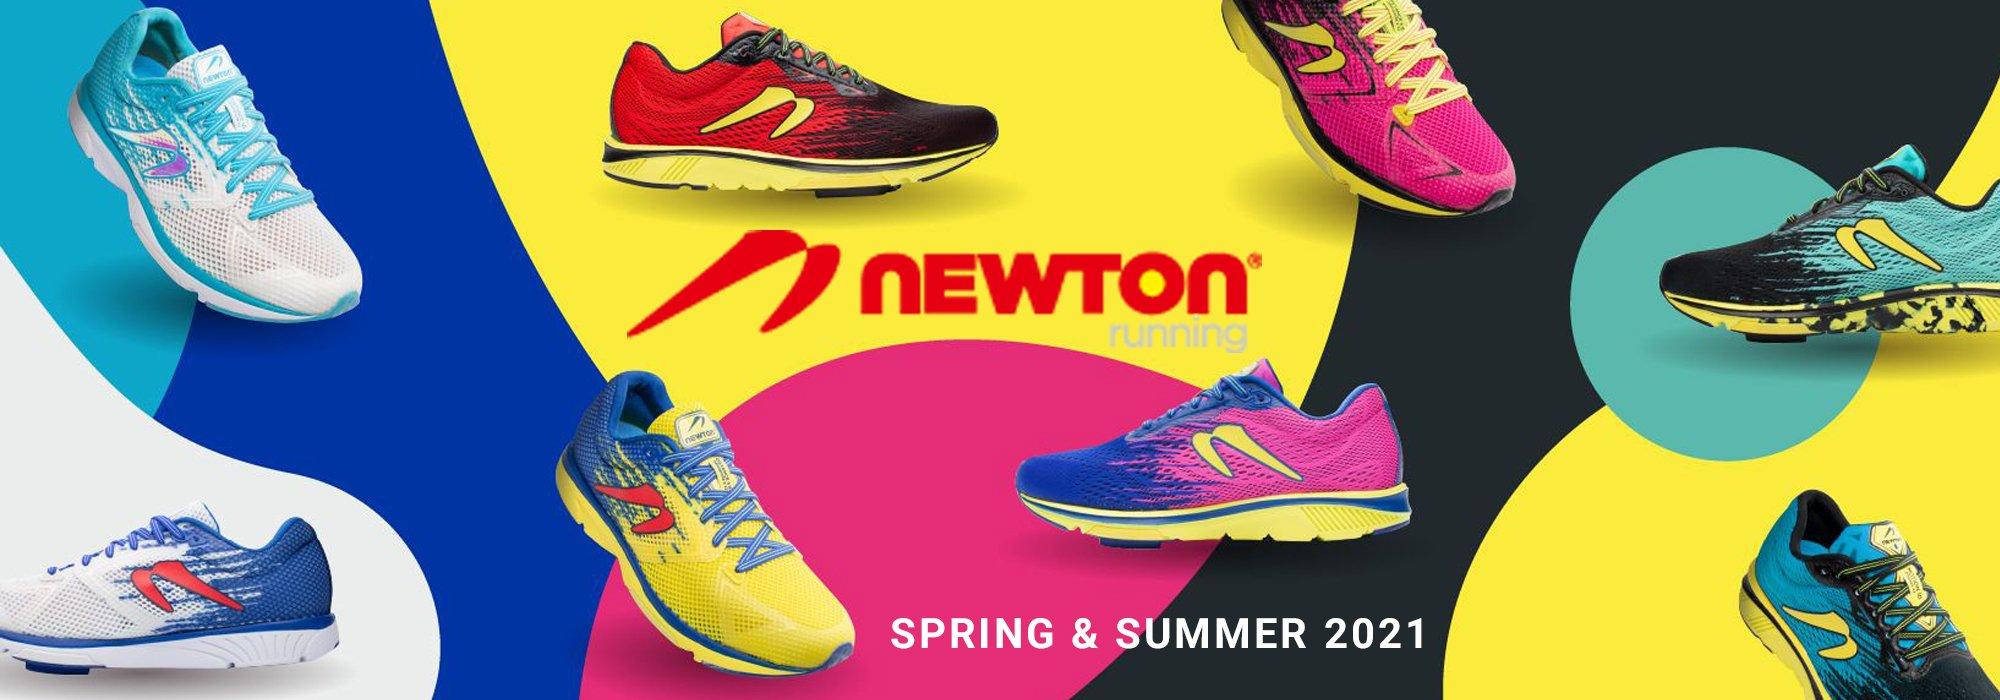 Banner newton-runnning-%E3%83%8B%E3%83%A5%E3%83%BC%E3%83%88%E3%83%B3%E3%83%A9%E3%83%B3%E3%83%8B%E3%83%B3%E3%82%B0